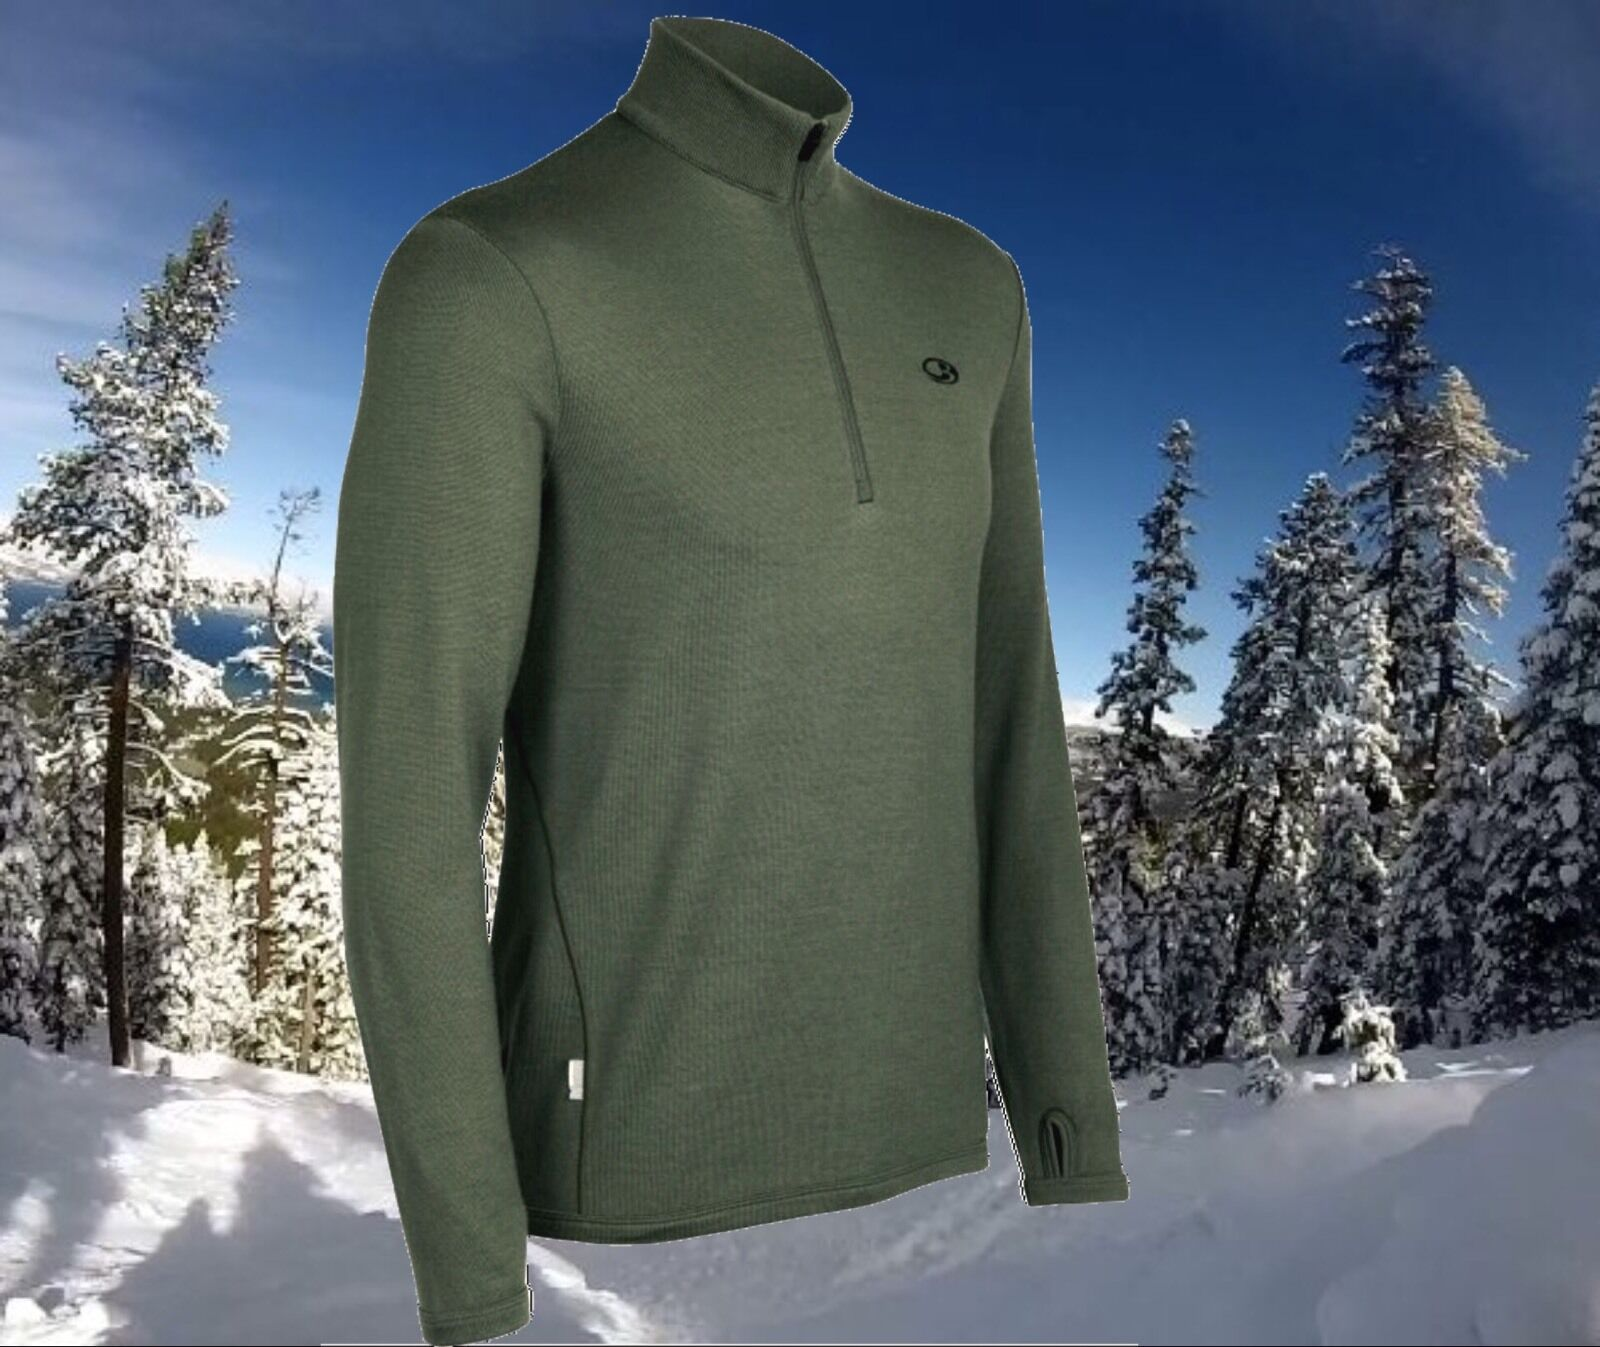 Icebreaker Original 320g Merino Wool ZIp Sports Top Sweater Mens XXXL Nwt  170